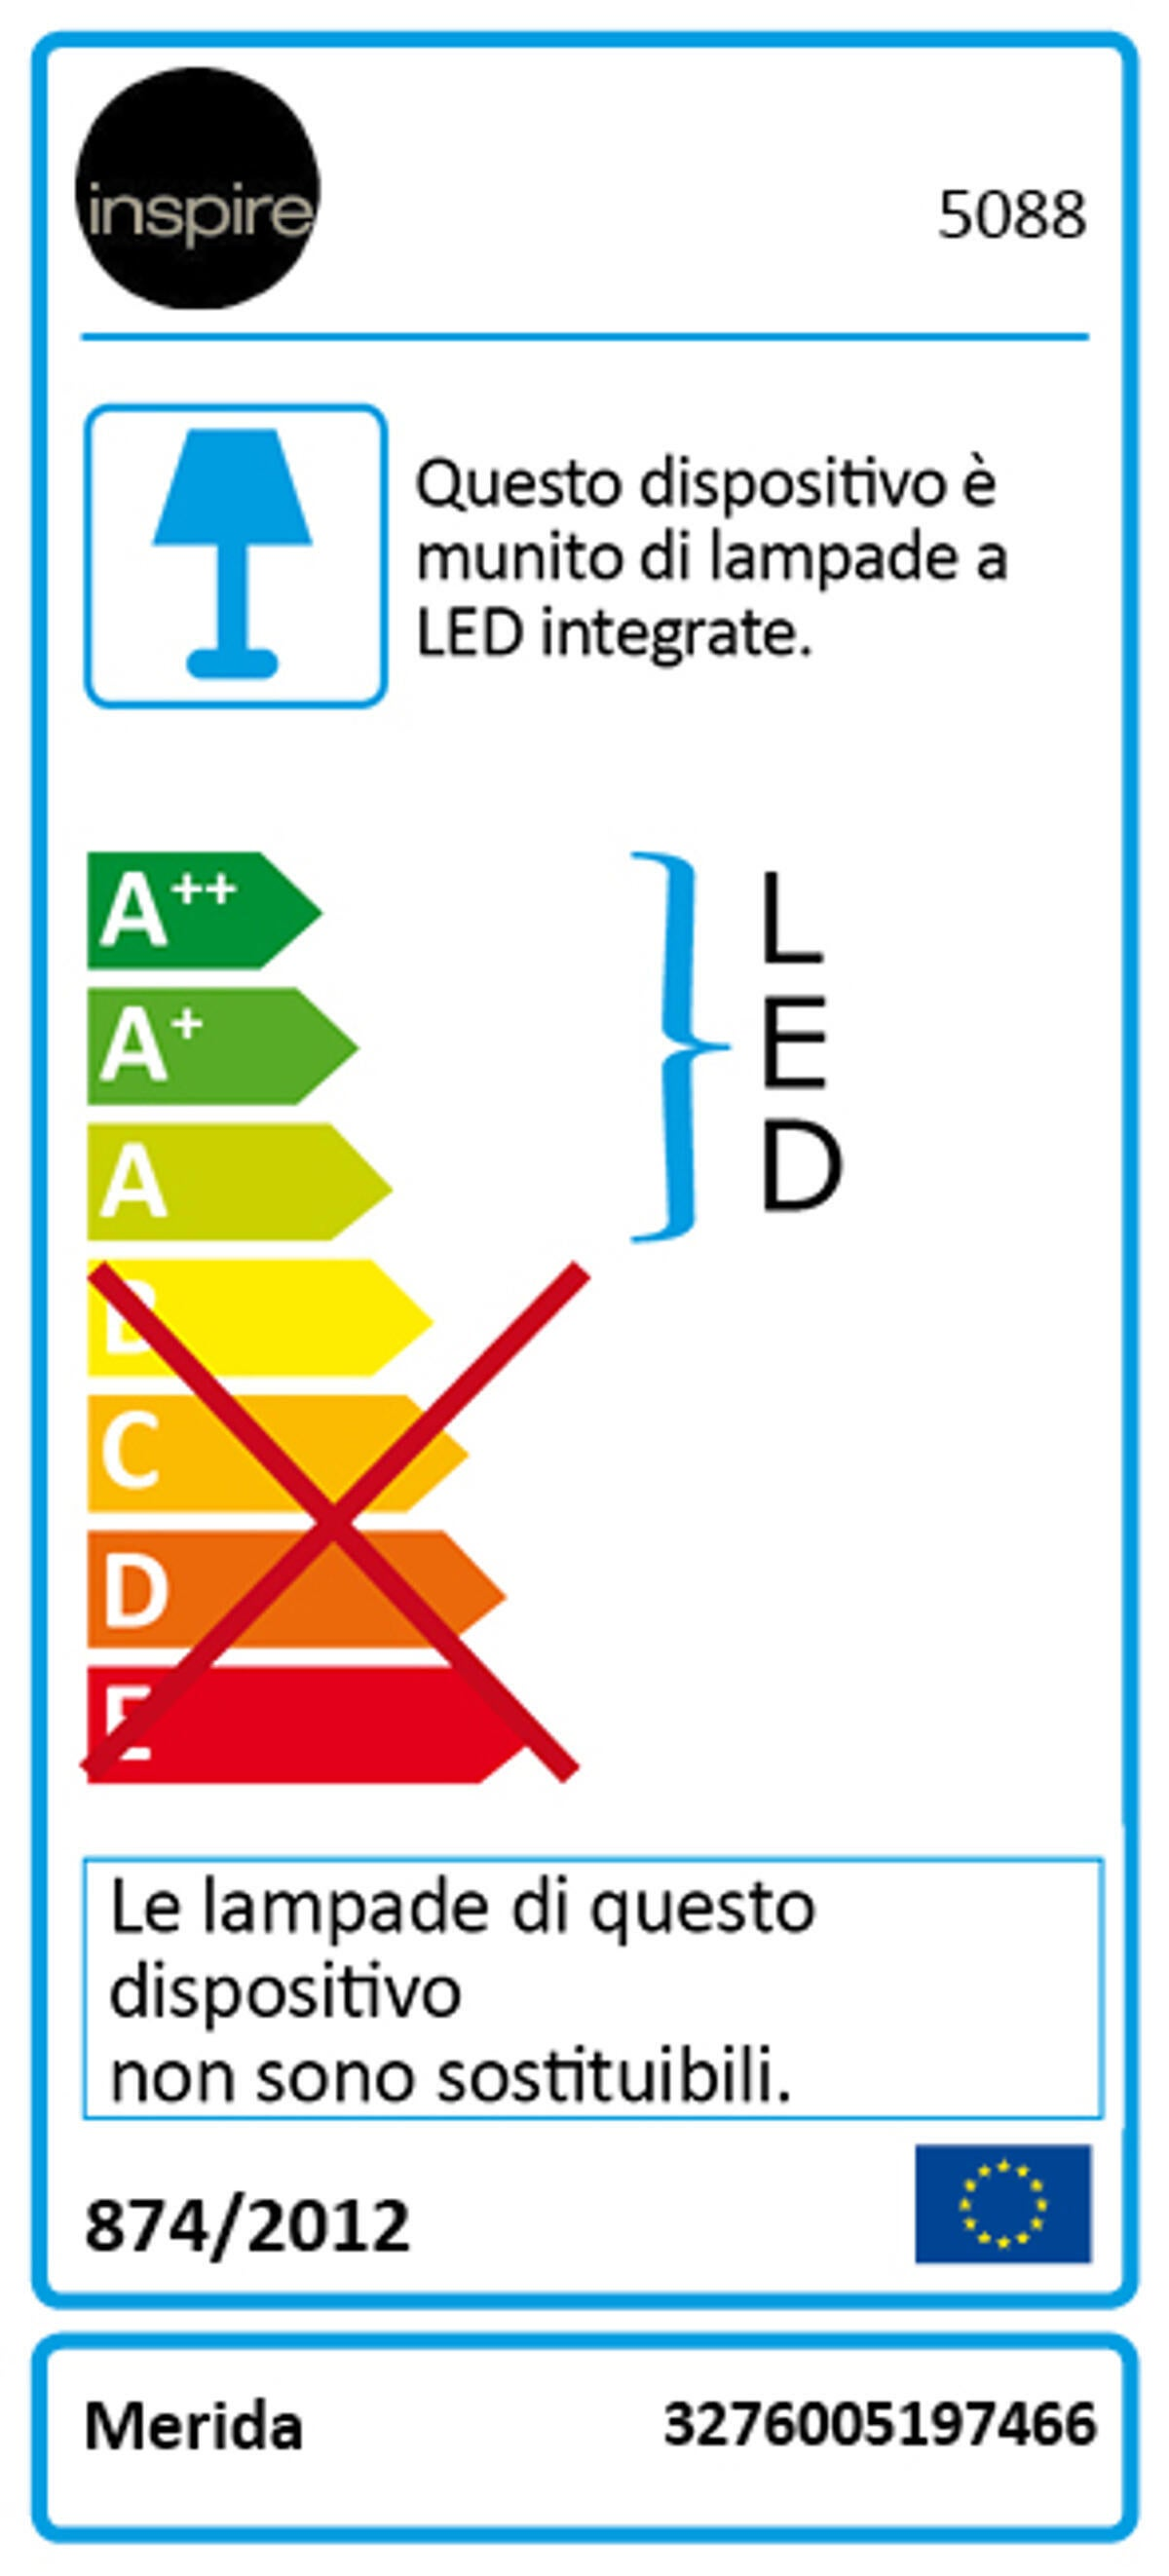 Illuminazione mobili LED integrato Merida 50 LM IP20 Inspire - 3